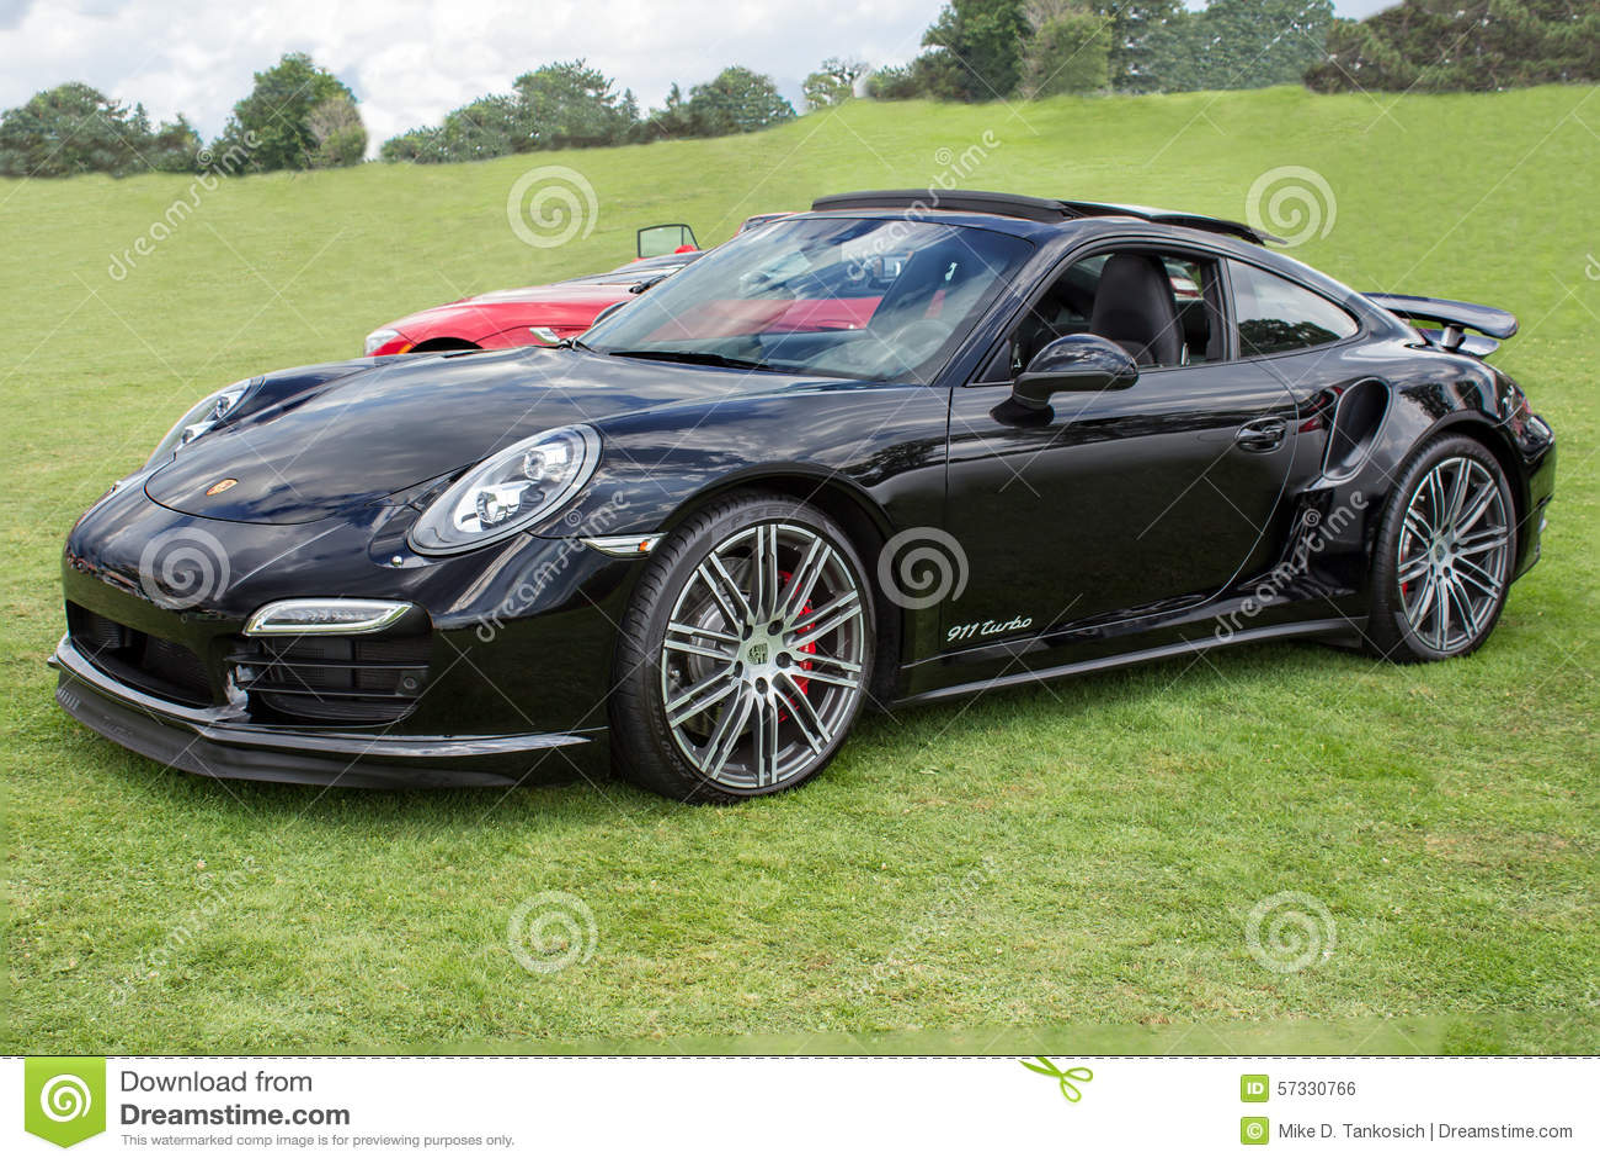 porsche 911 turbo black. editorial stock photo download black porsche 911 turbo